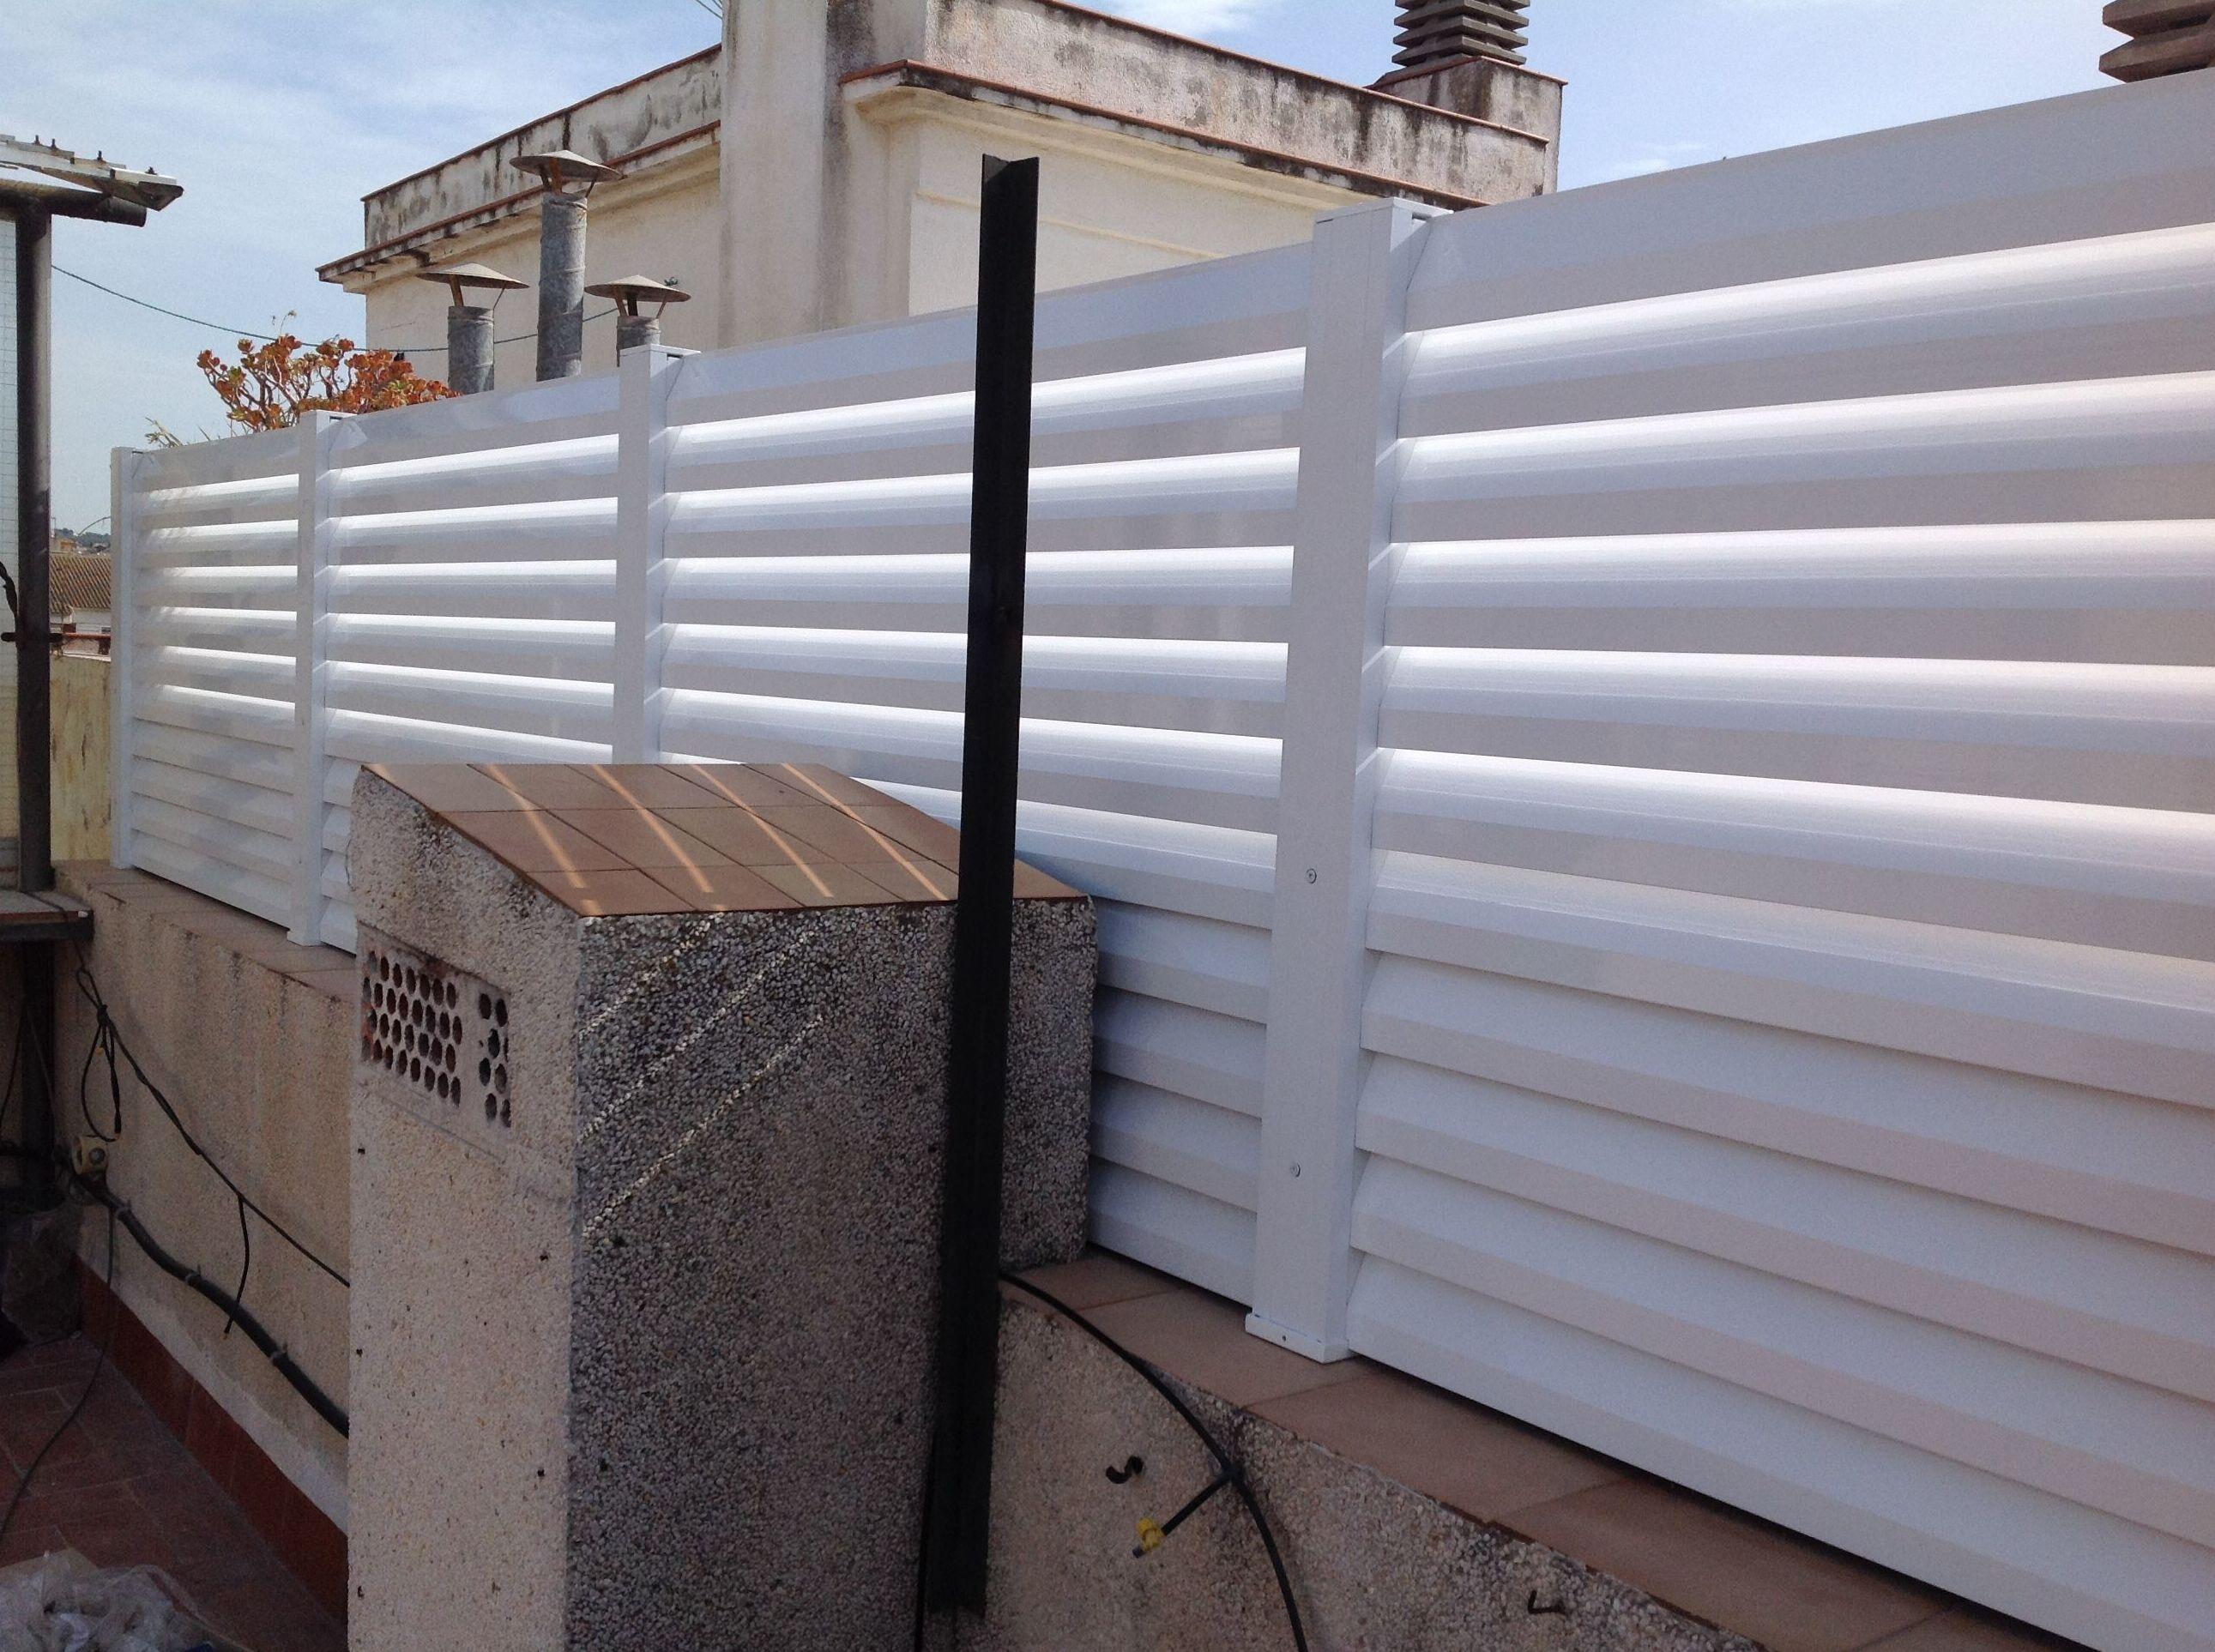 Foto 9 de Carpintería de aluminio, metálica y PVC en Calafell | Aluminis Solé